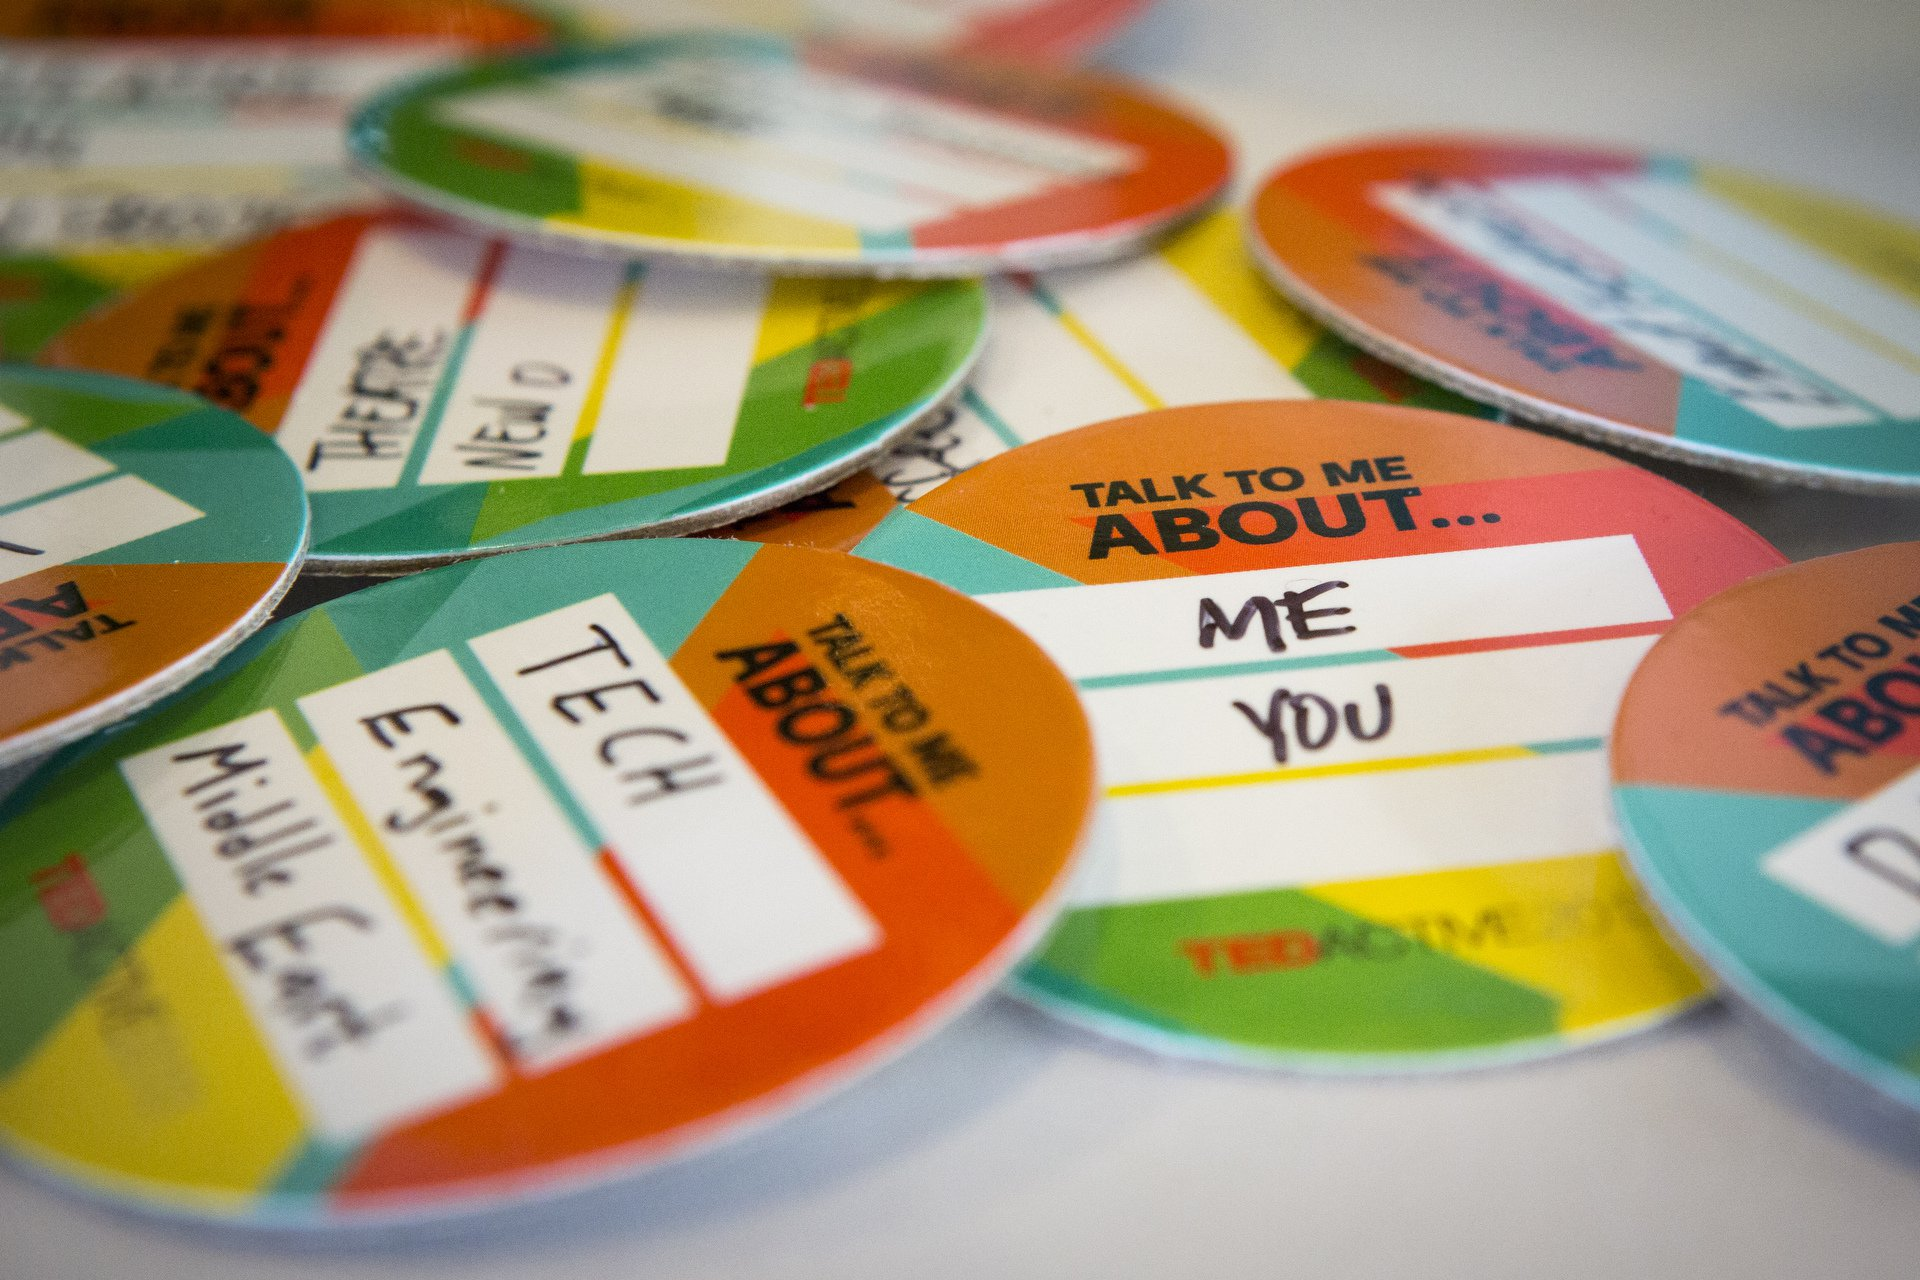 Top 10 Most Beautiful School Name Tags | MakeBadge |Creative Name Badge Designs